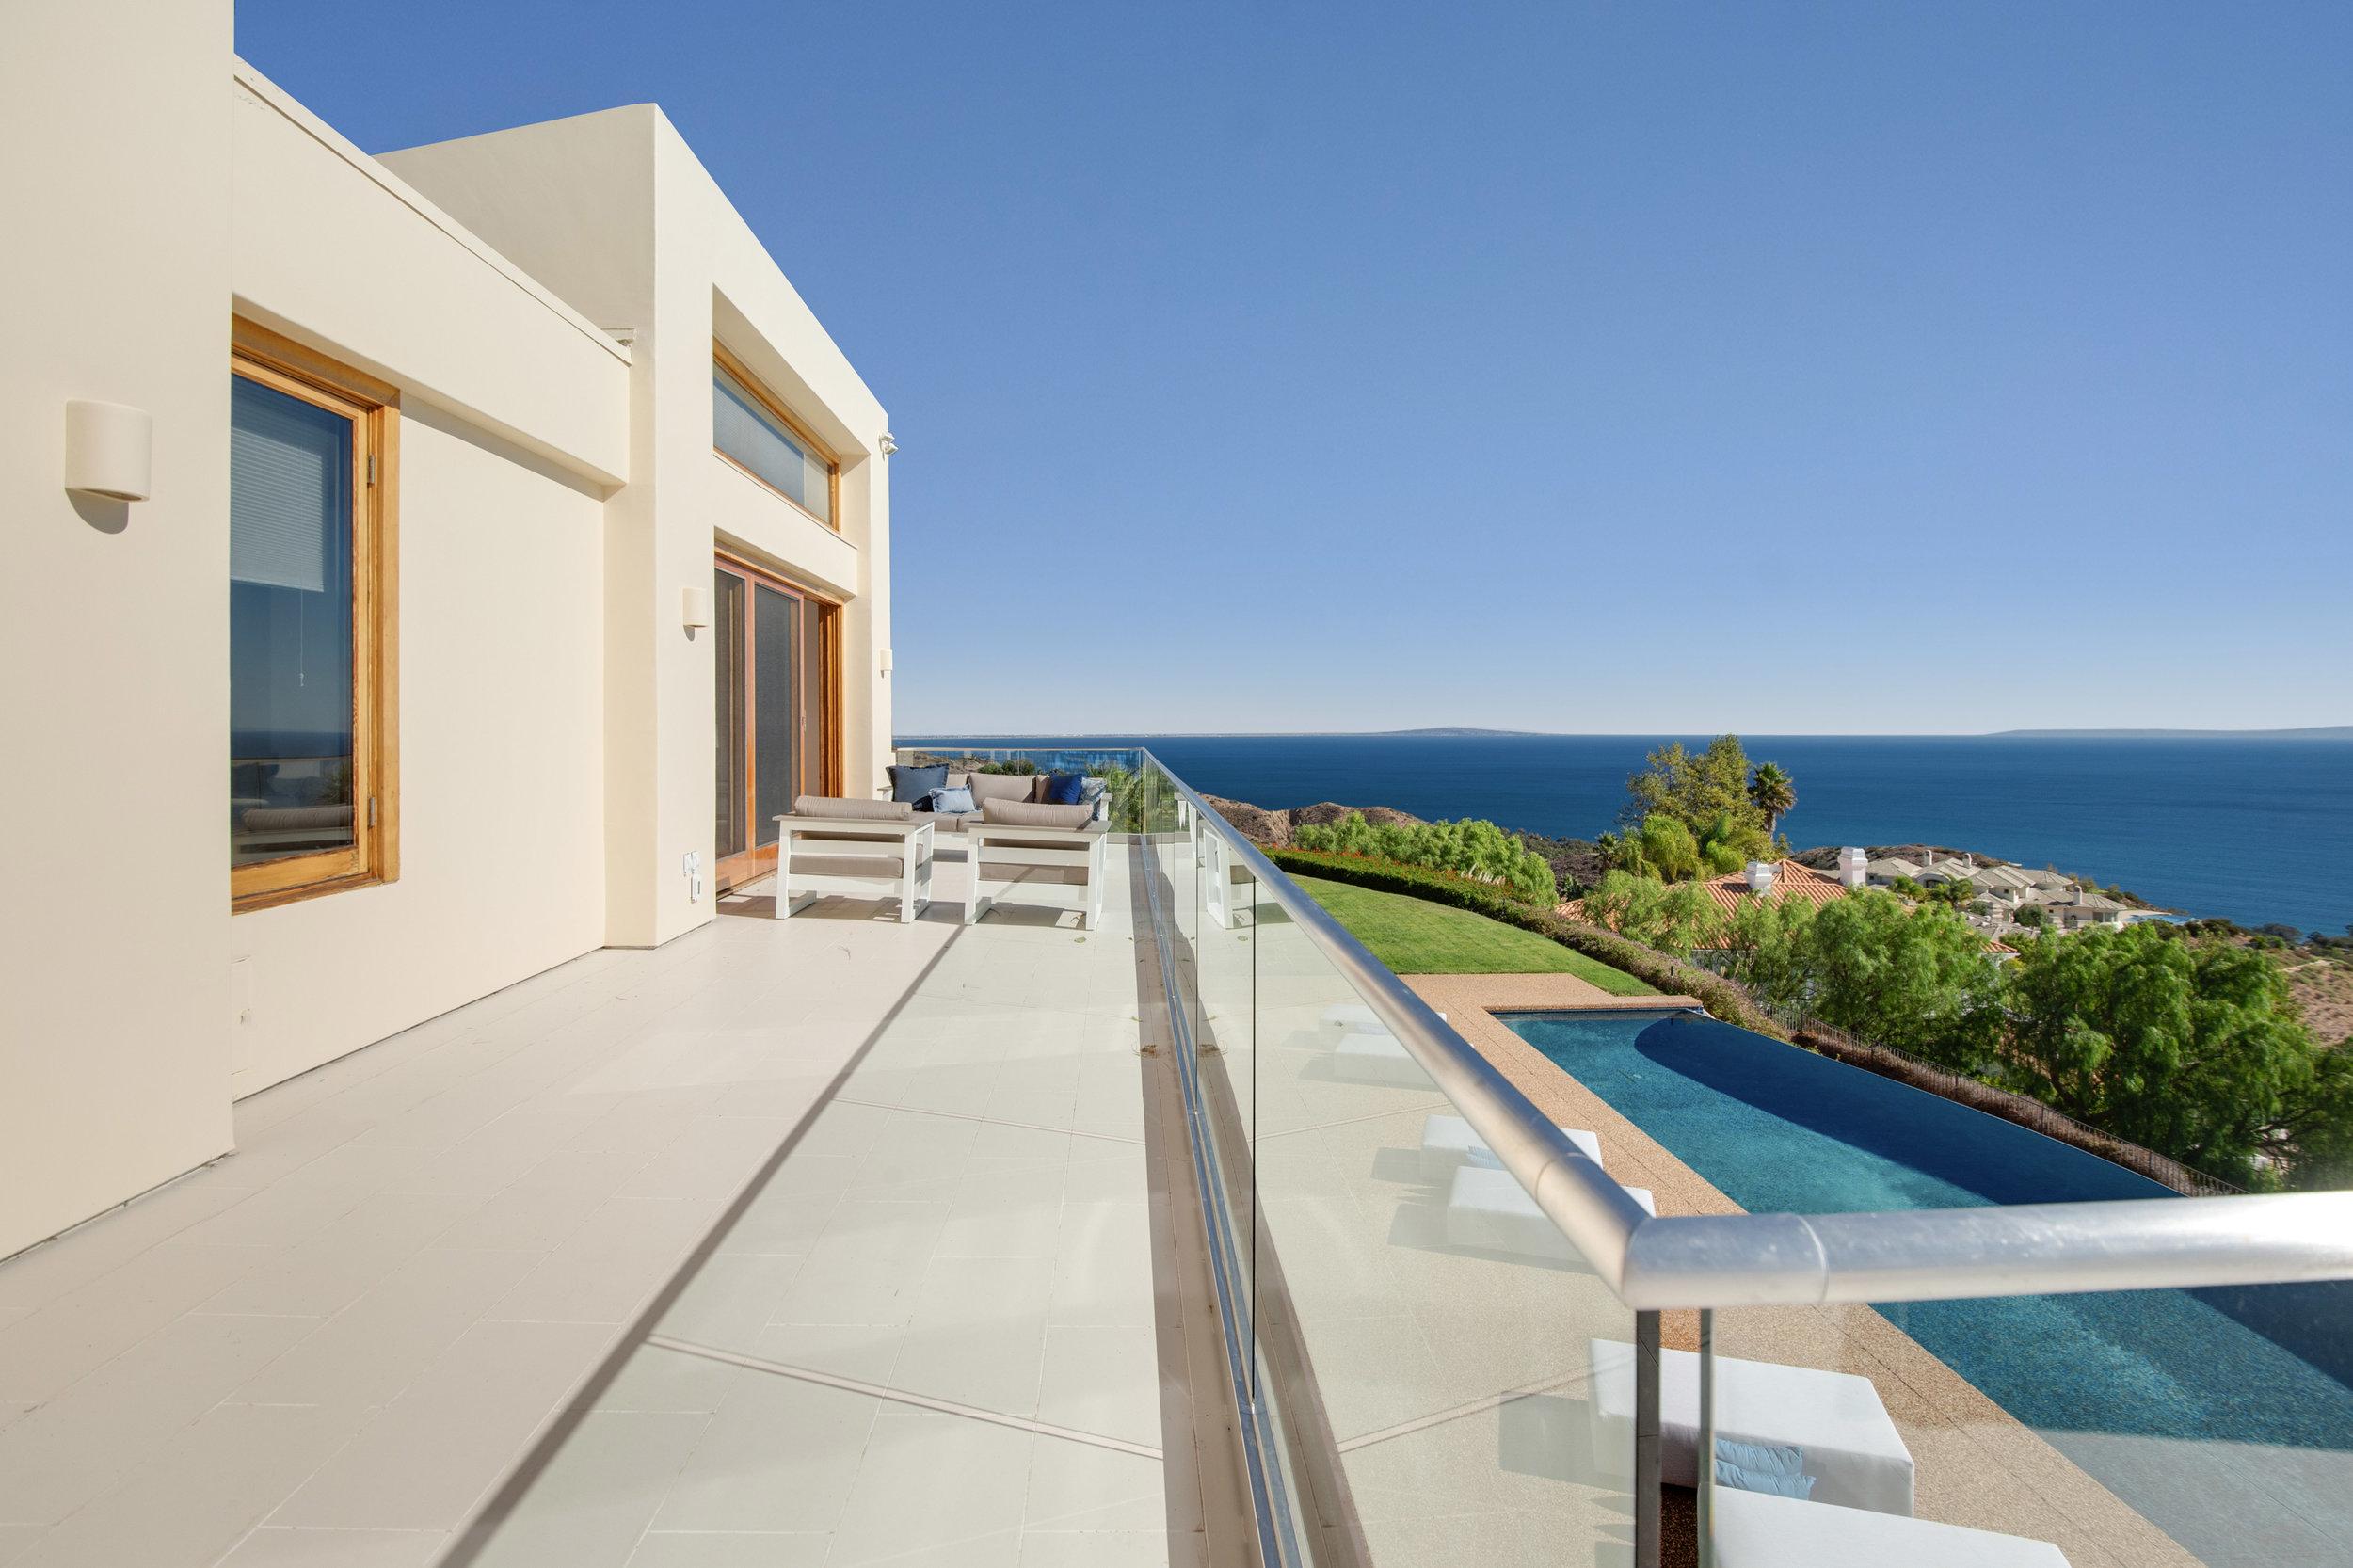 015 Deck Ocean View 27475 Latigo Bay View Drive For Sale Lease The Malibu Life Team Luxury Real Estate.jpg